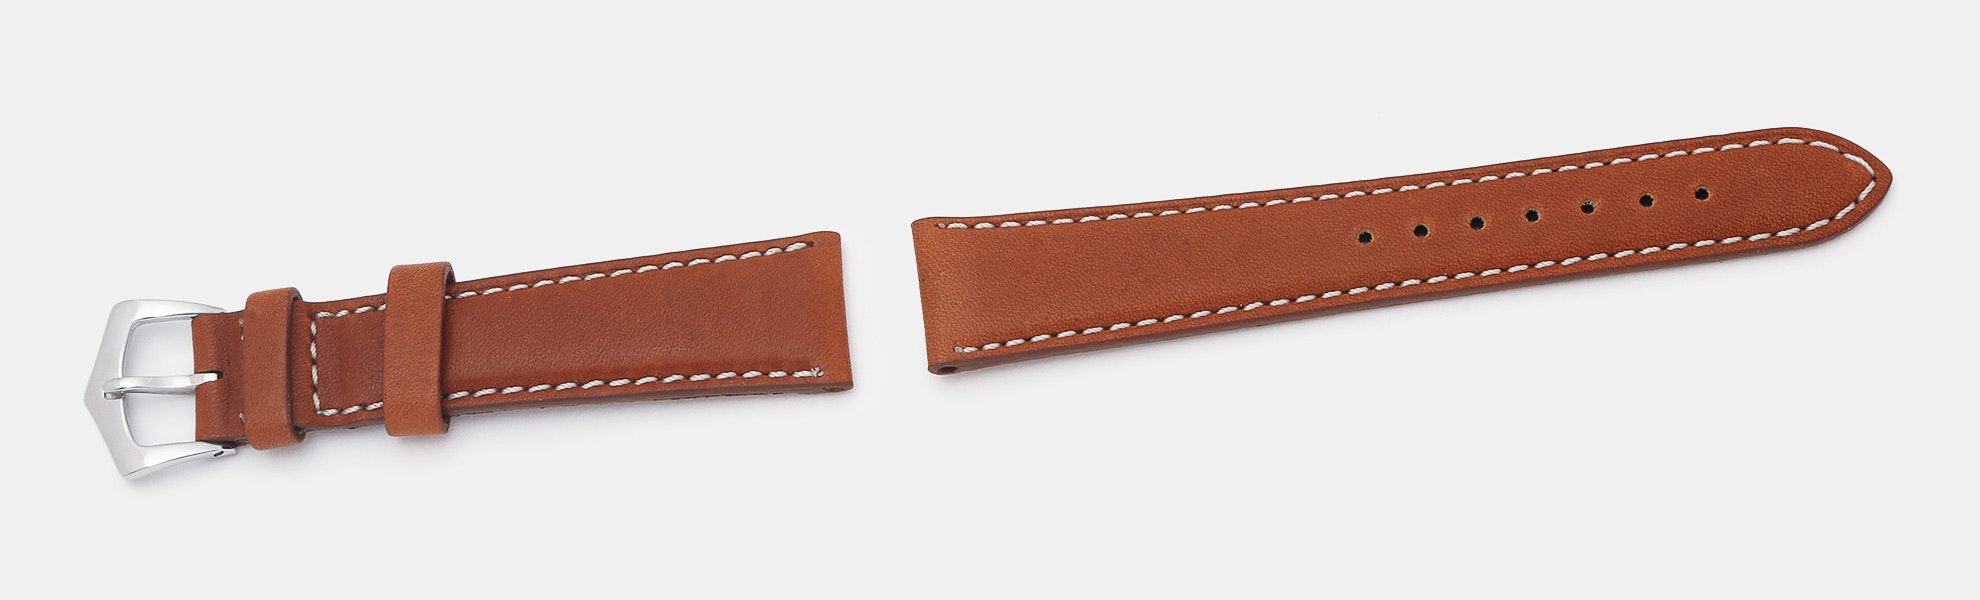 Milano Straps Barenia Leather Watch Strap